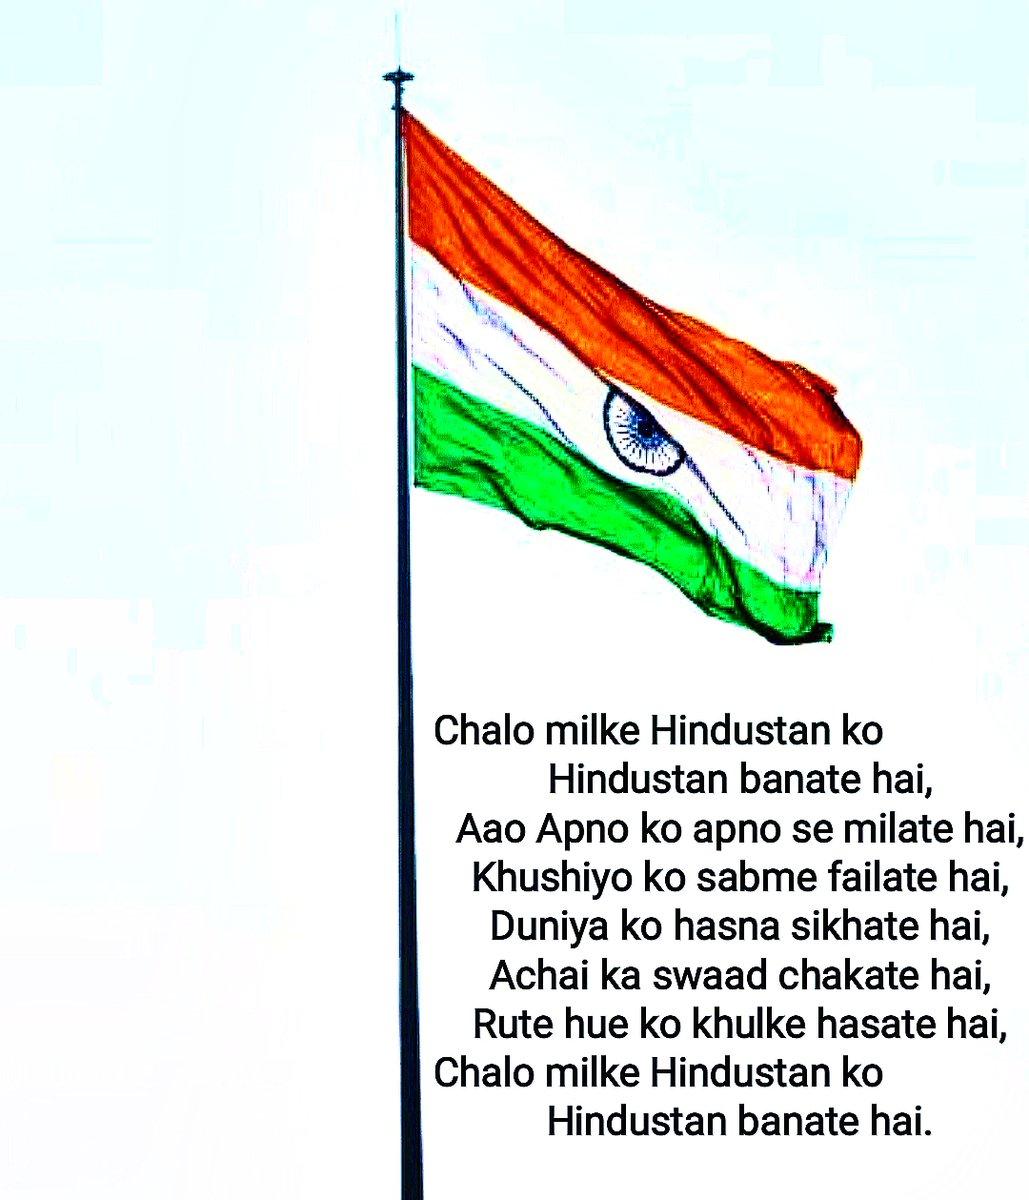 Chalo milke Hindustan ko Hindustan banate hai ❤️ Please visit my YouTube channel 🙏🙏🙏 Link in my bio🙏 #shayari #poems #Indian #India #Hindustani #Hindustan #Love #support #proudindian🇮🇳#shayar #poemislove #shayarana #meradesh #poet https://t.co/nrctKdtQp2